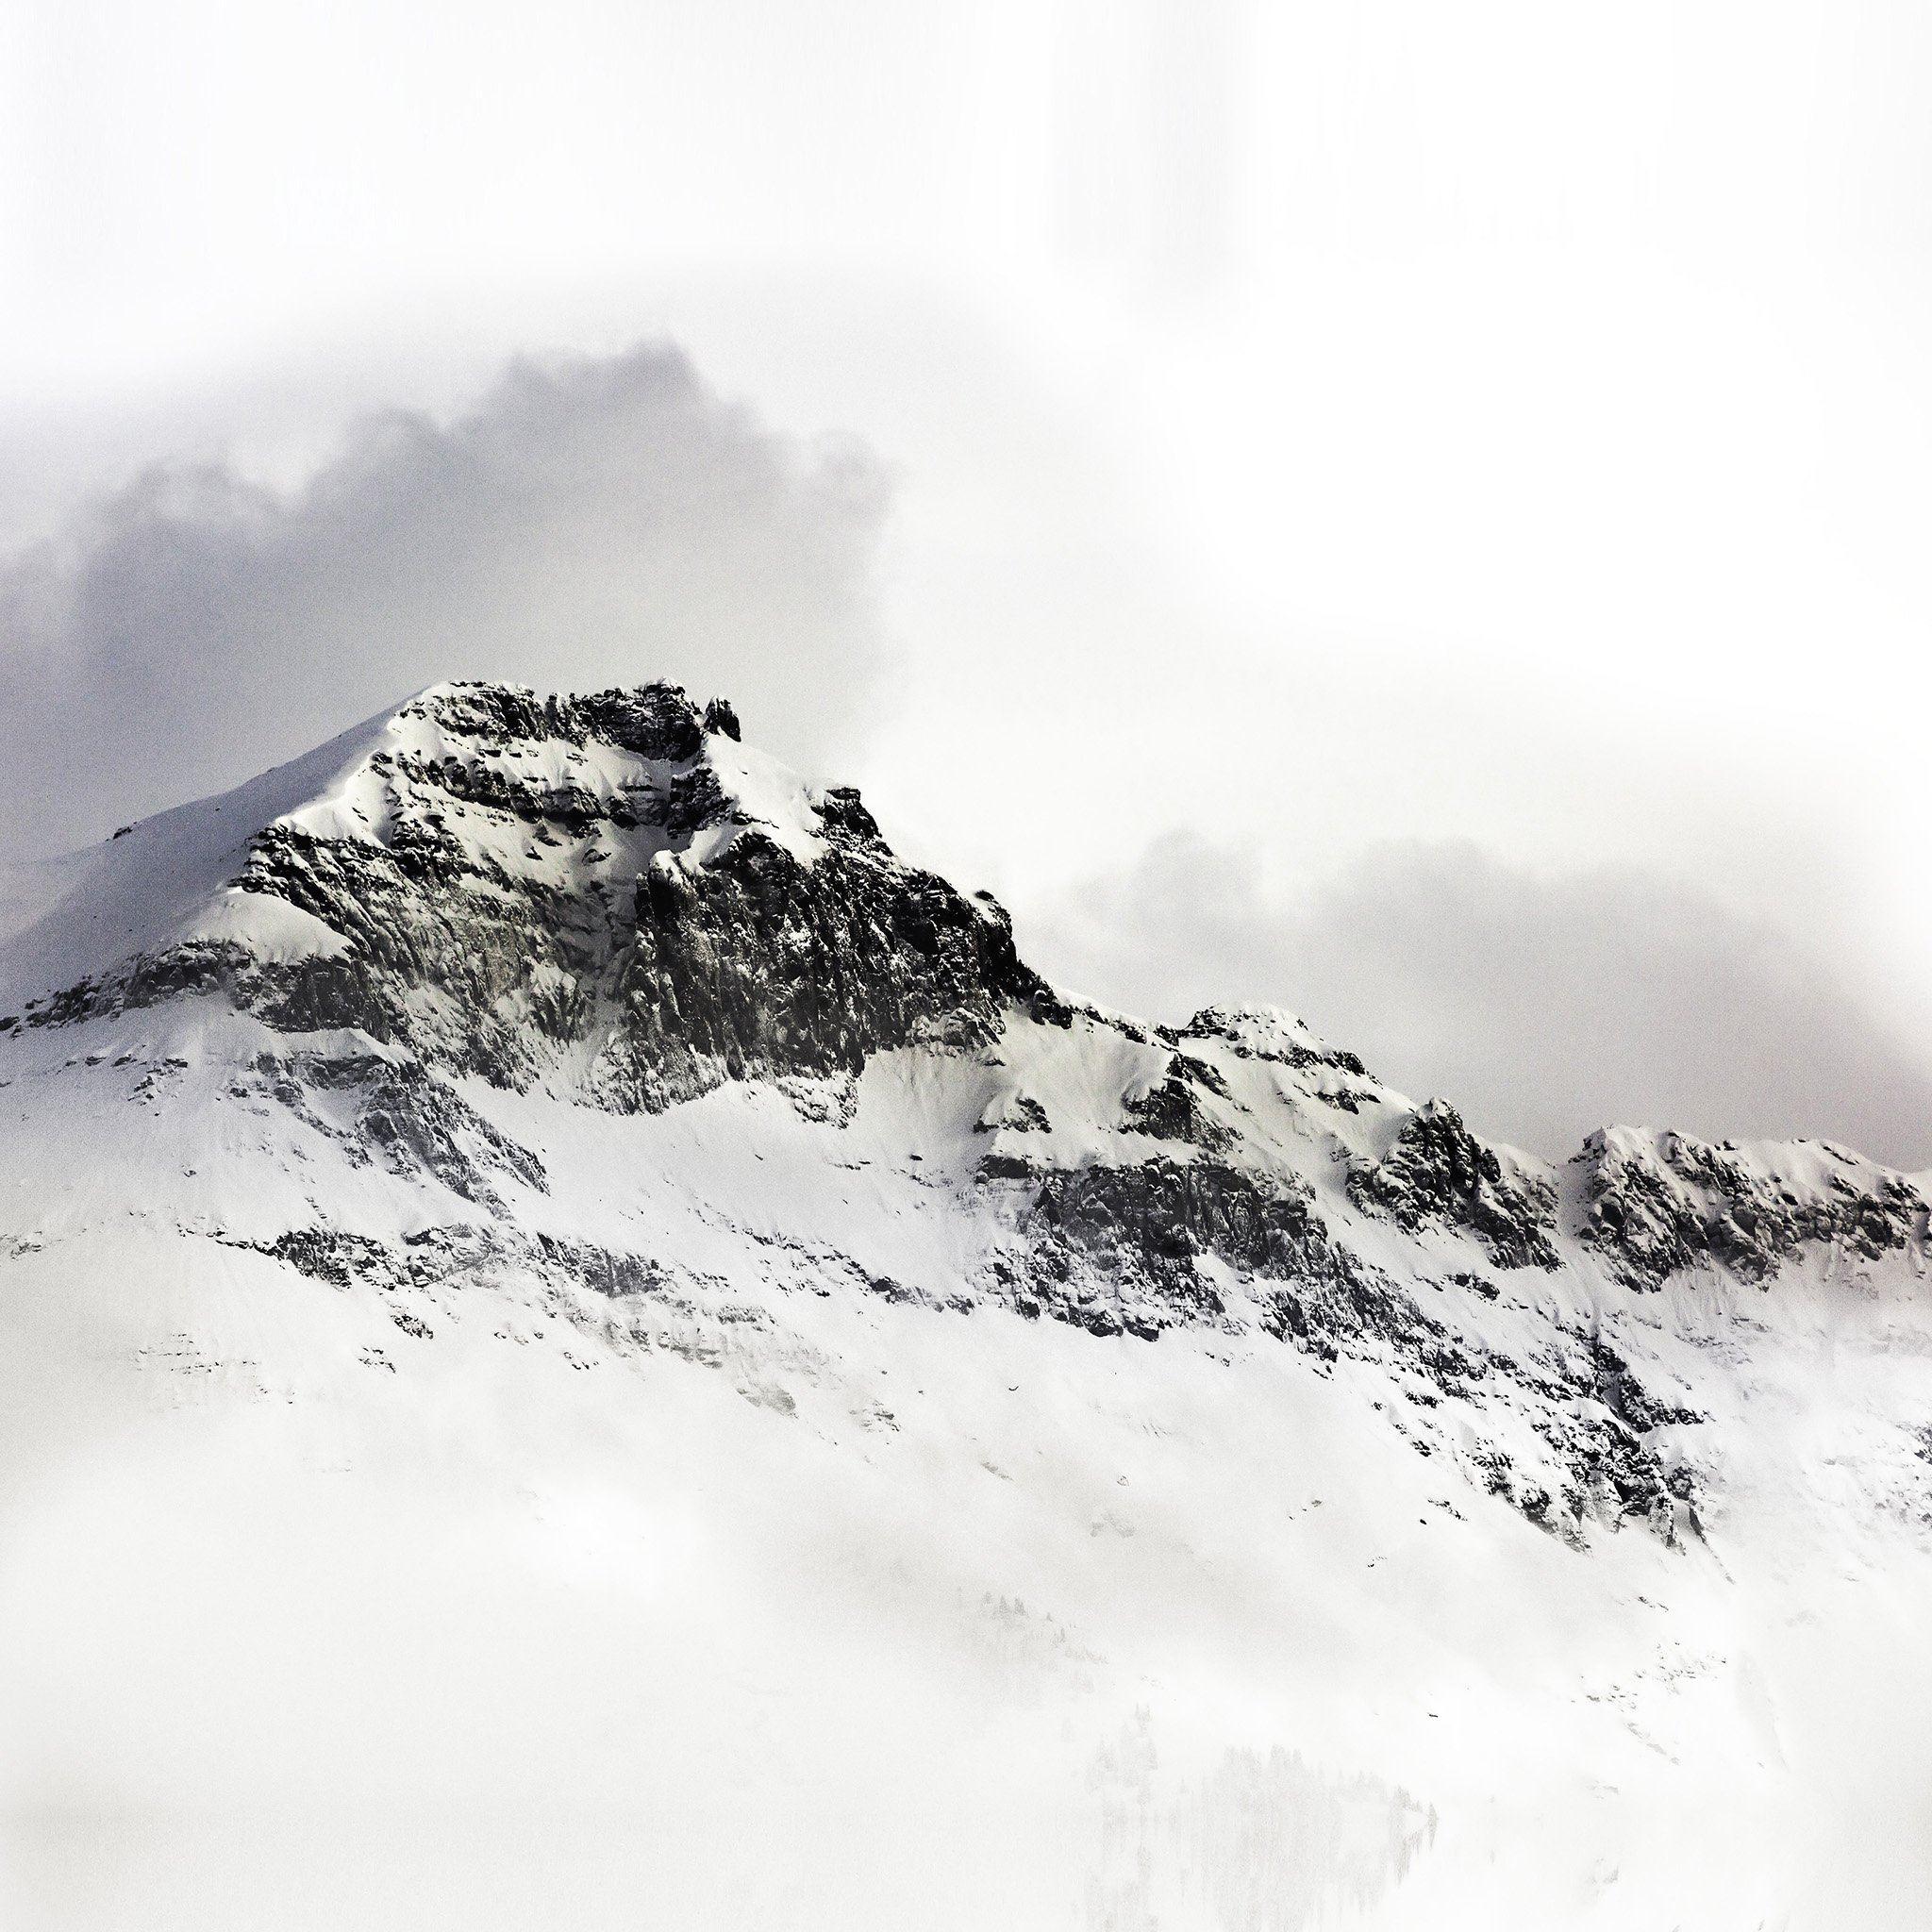 Mountain White Snow Winter Minimal Ipad Air Wallpapers Free Download